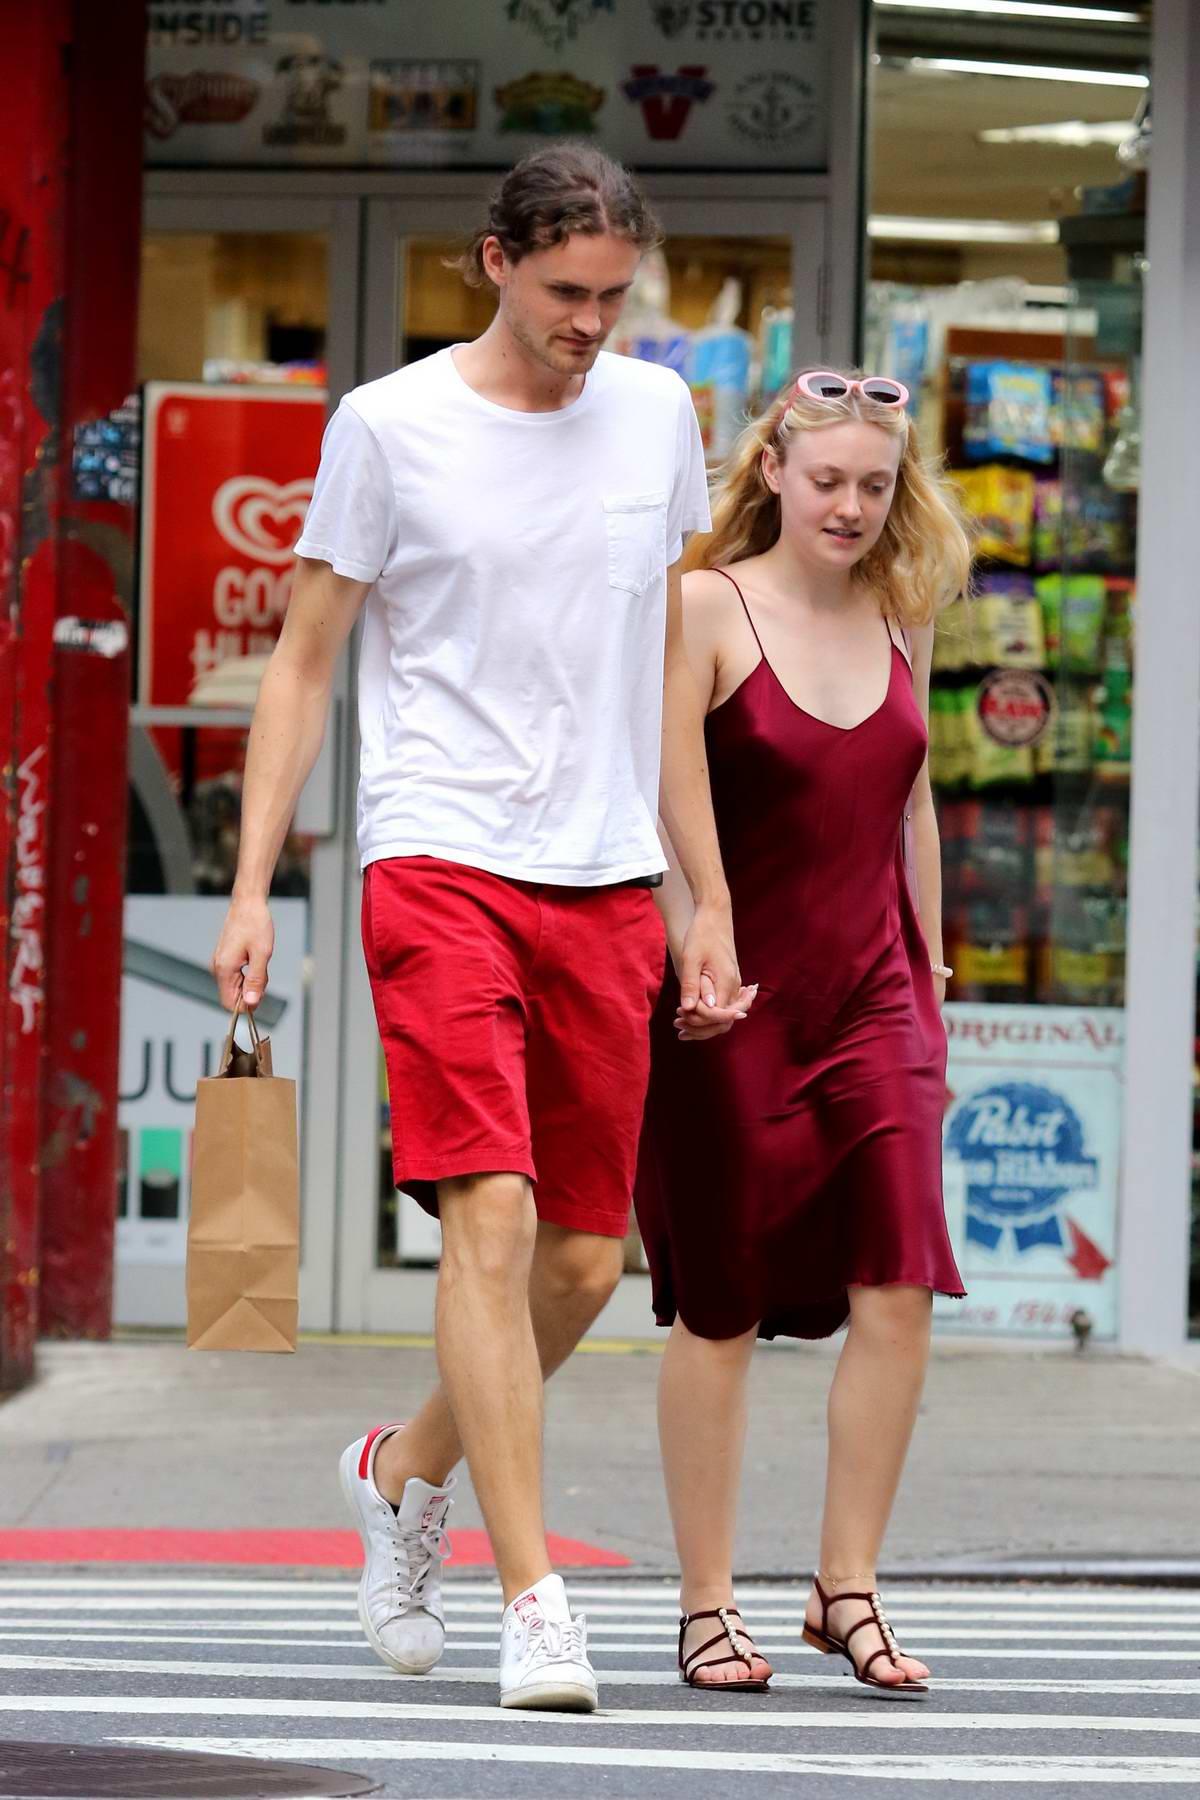 Dakota Fanning seen wearing a red silk dress while enjoying a romantic stroll with boyfriend Henry Frye after dinner in New York City